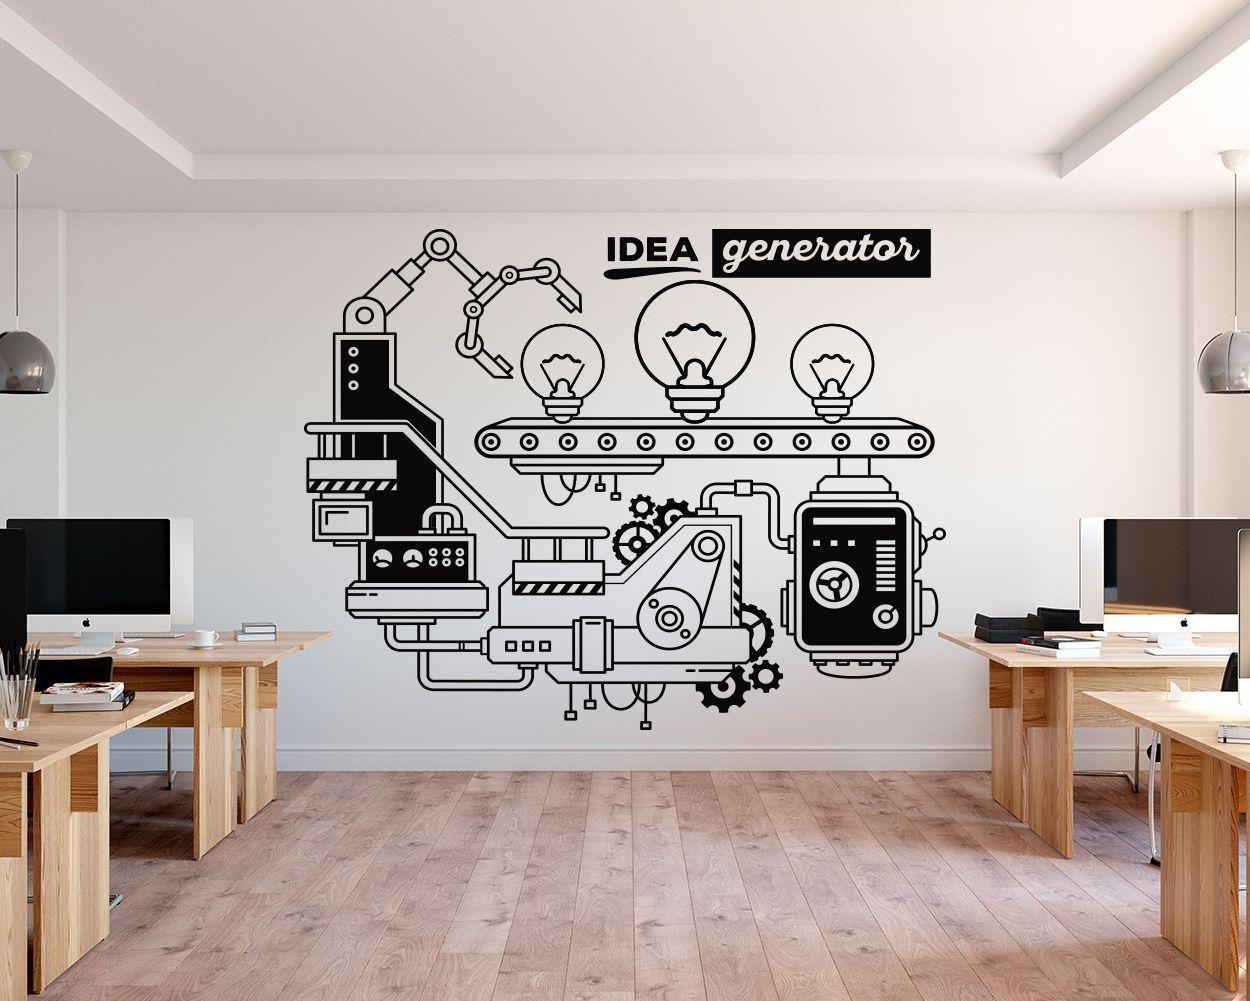 Idea Generator Office Wall Decor Kuarki Lifestyle Solutions Office Wall Decals Office Wall Design Office Wall Graphics